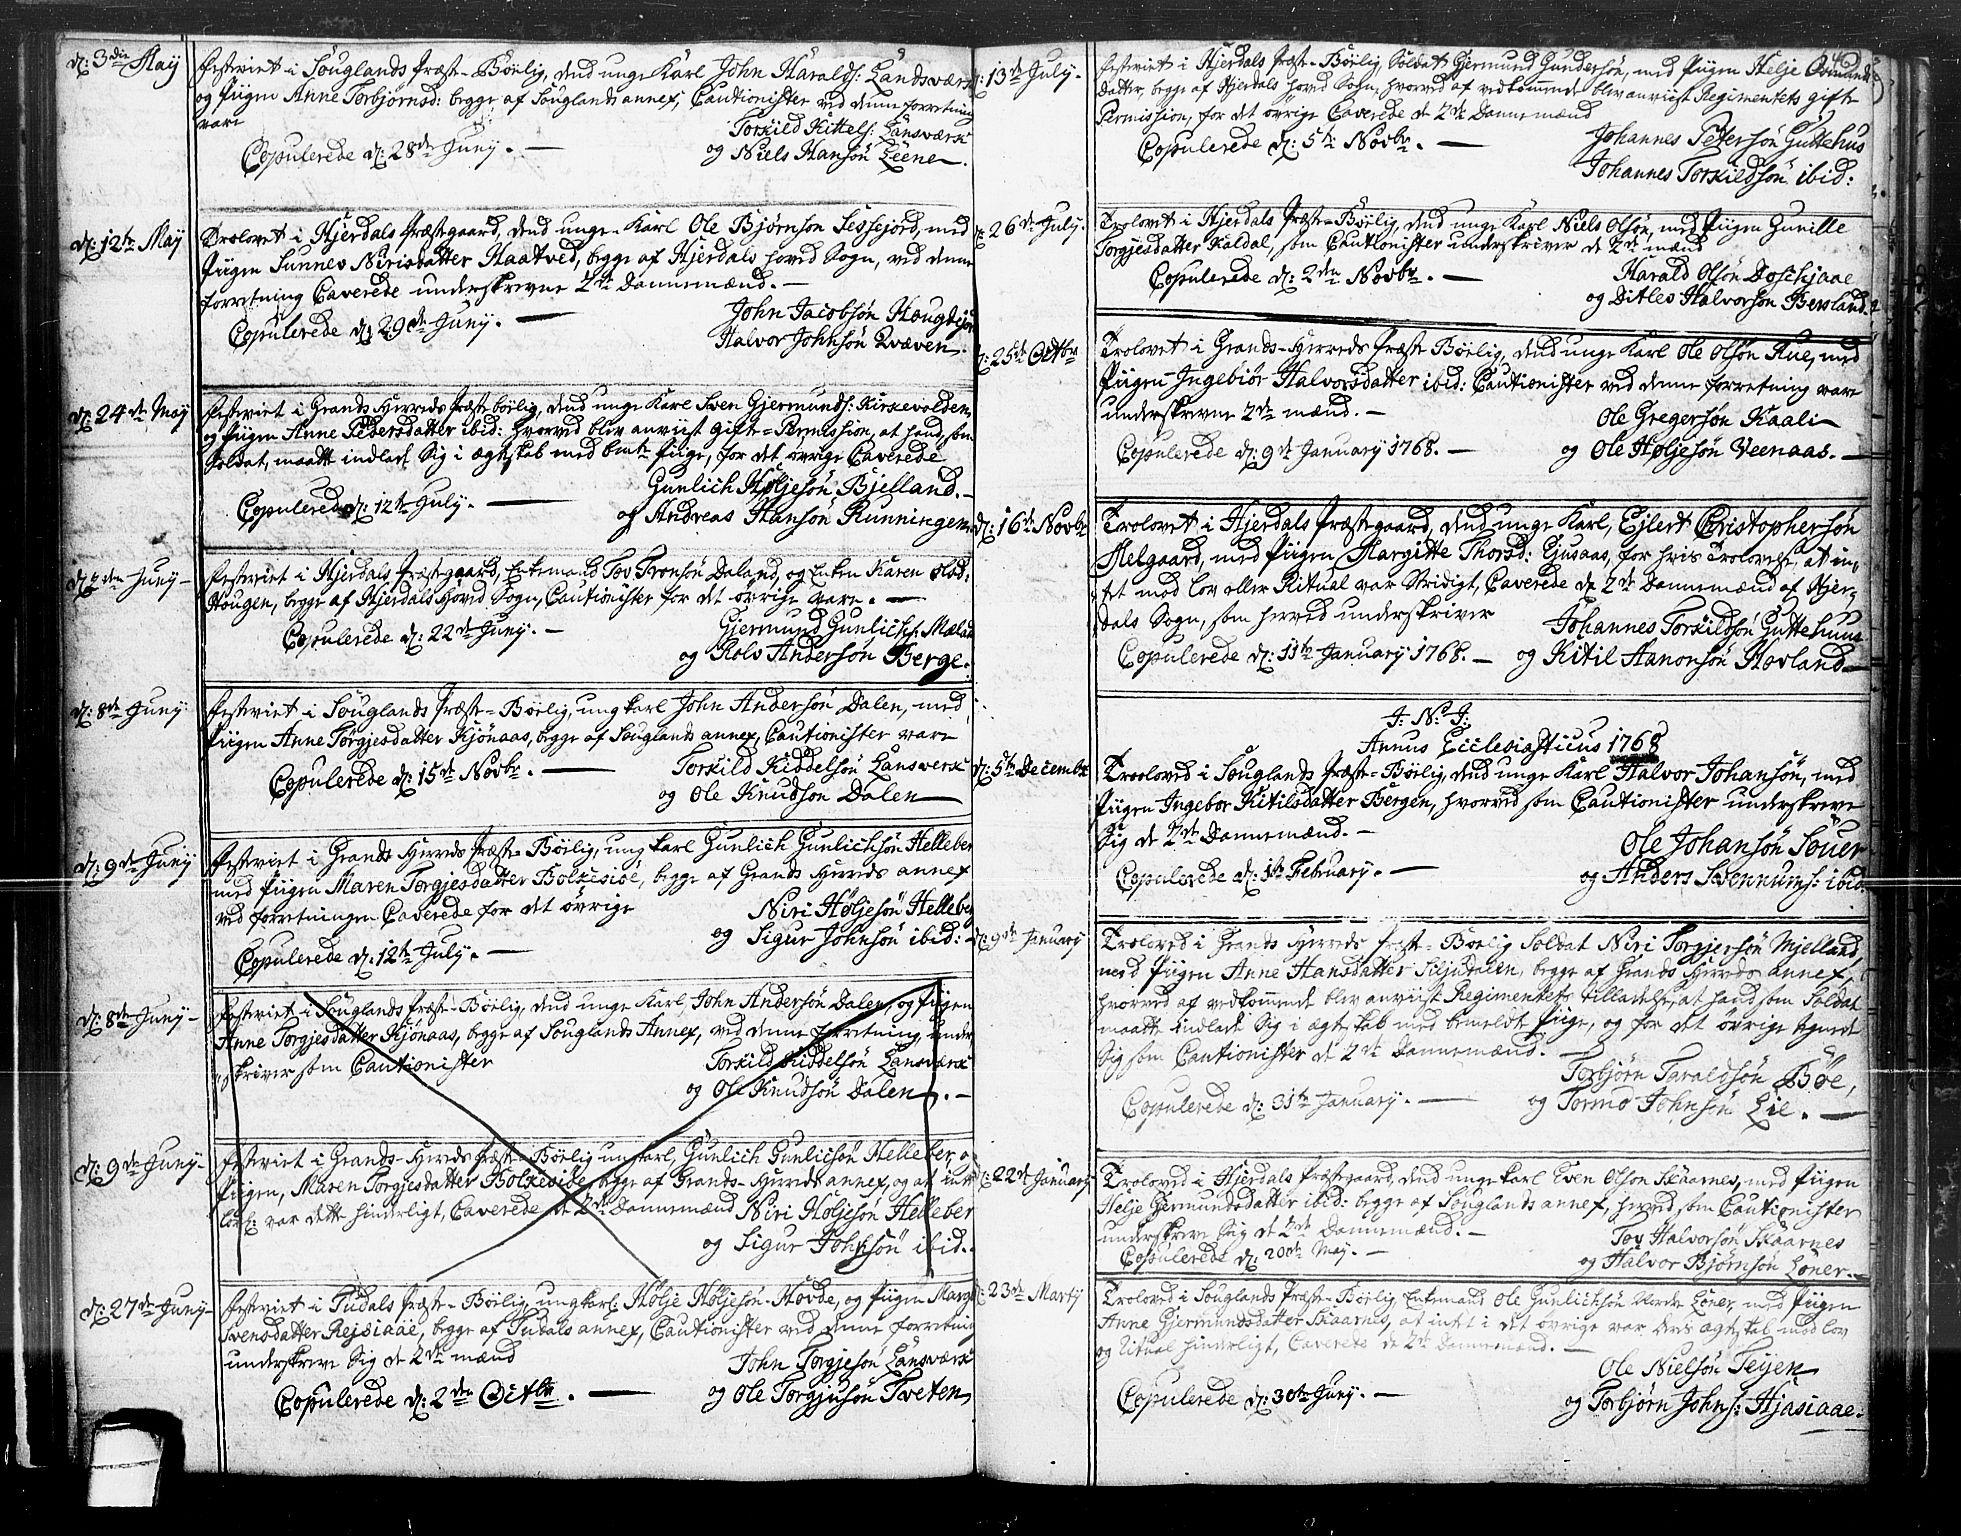 SAKO, Hjartdal kirkebøker, F/Fa/L0004: Ministerialbok nr. I 4, 1727-1795, s. 46